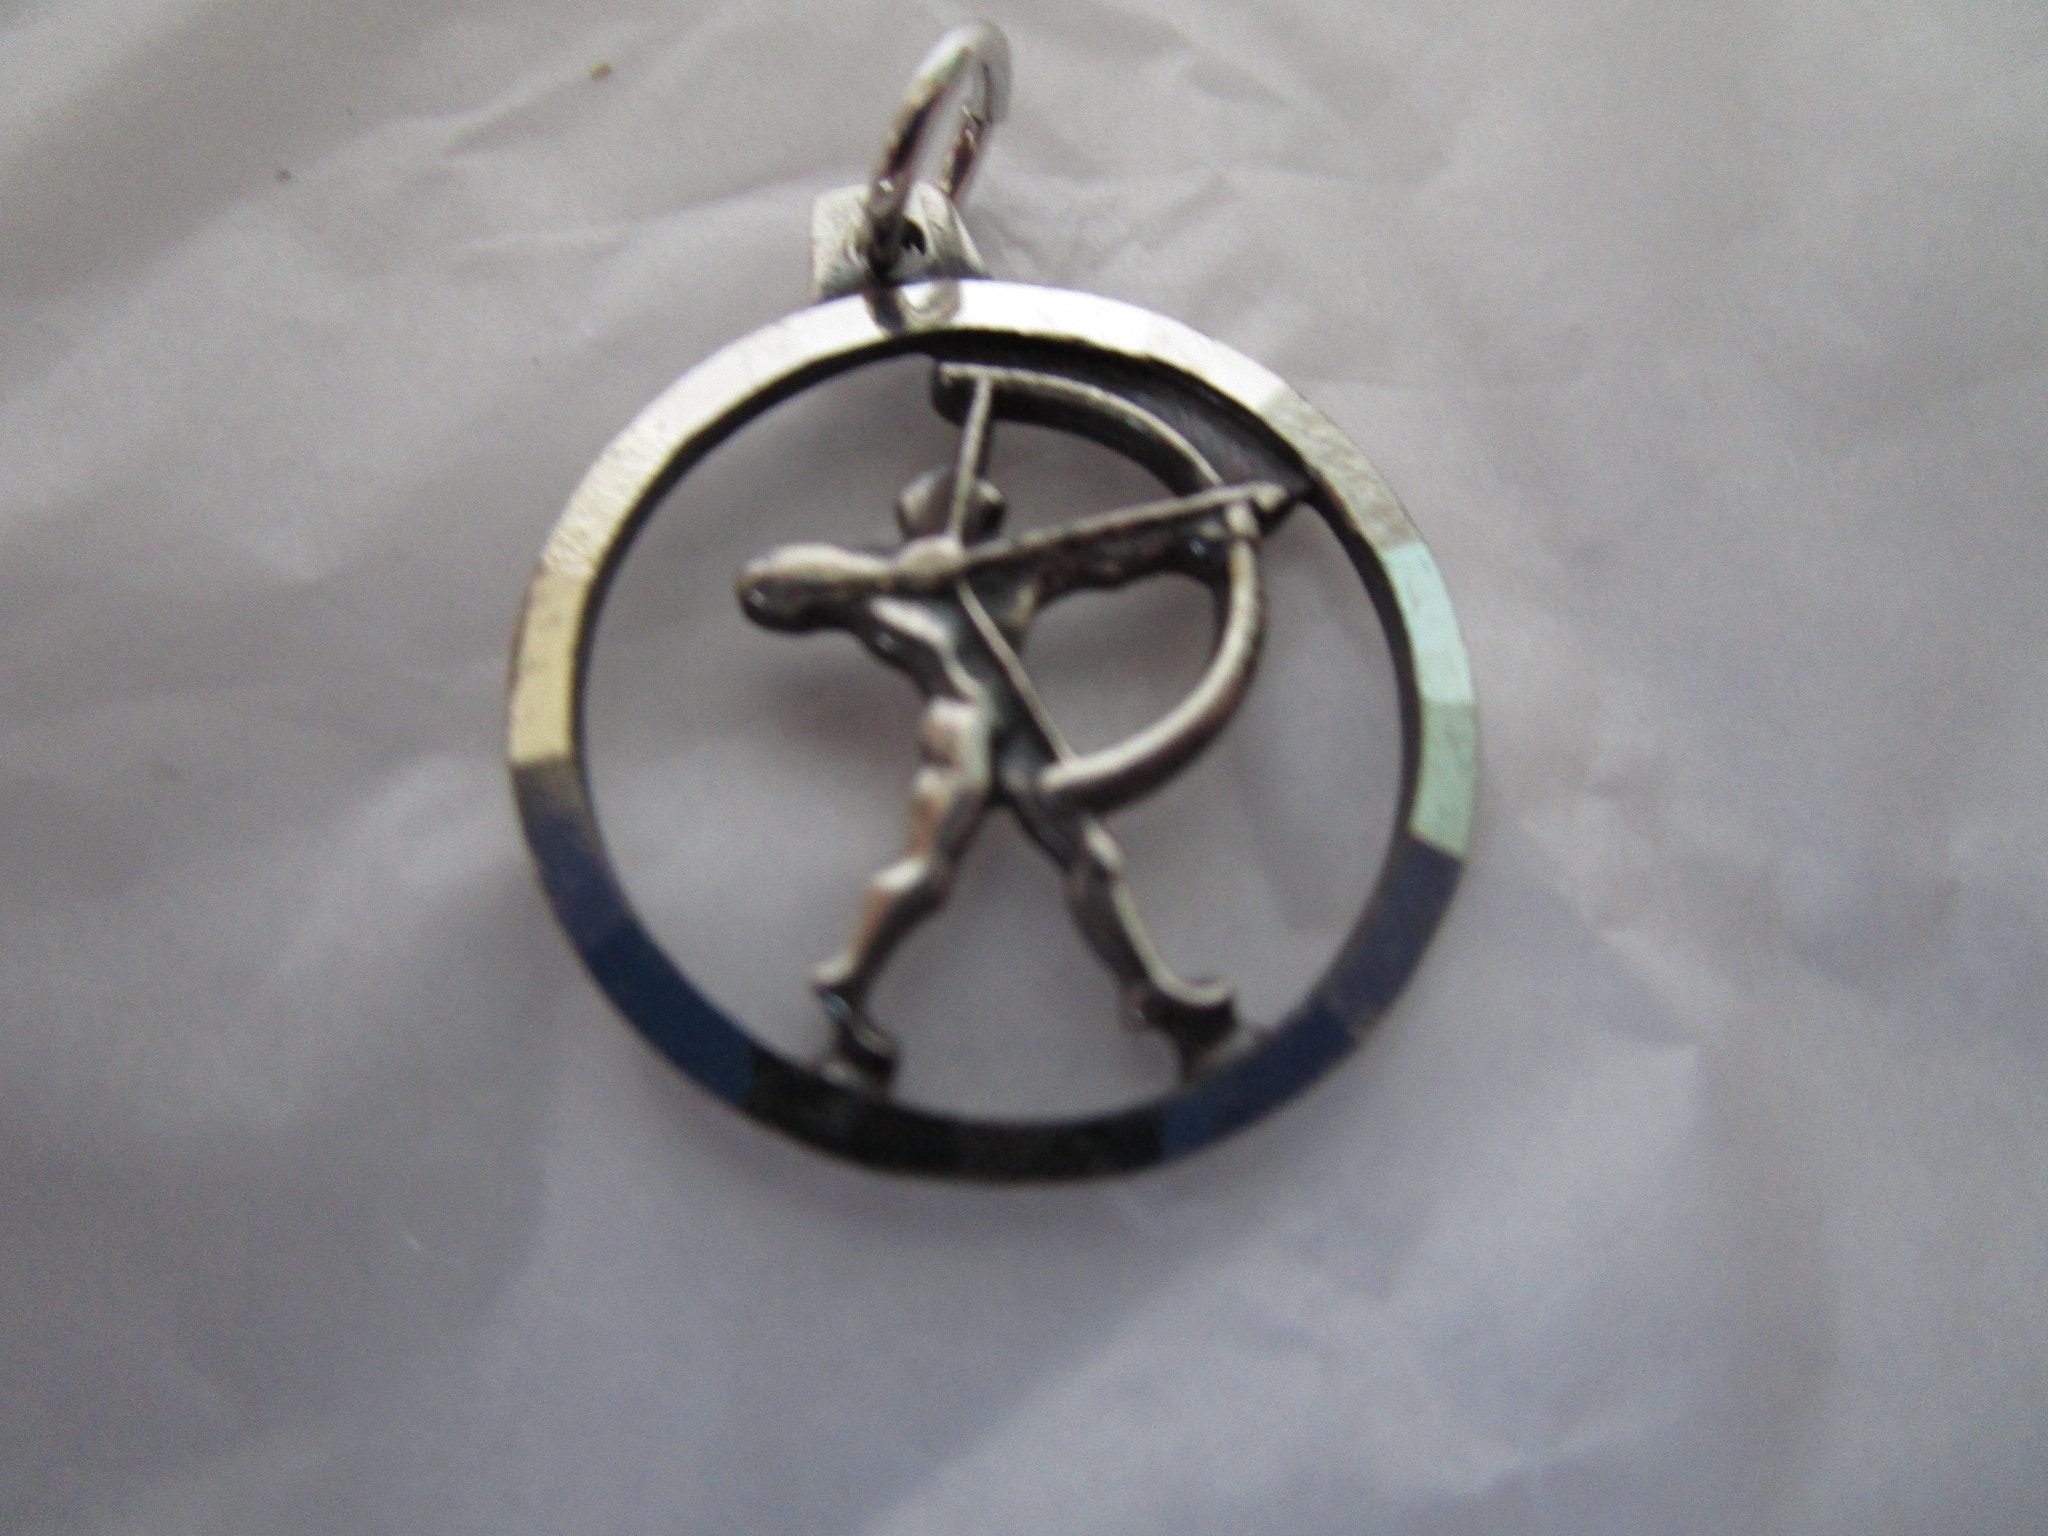 Vintage L W M L Enameled Charm or Pendant